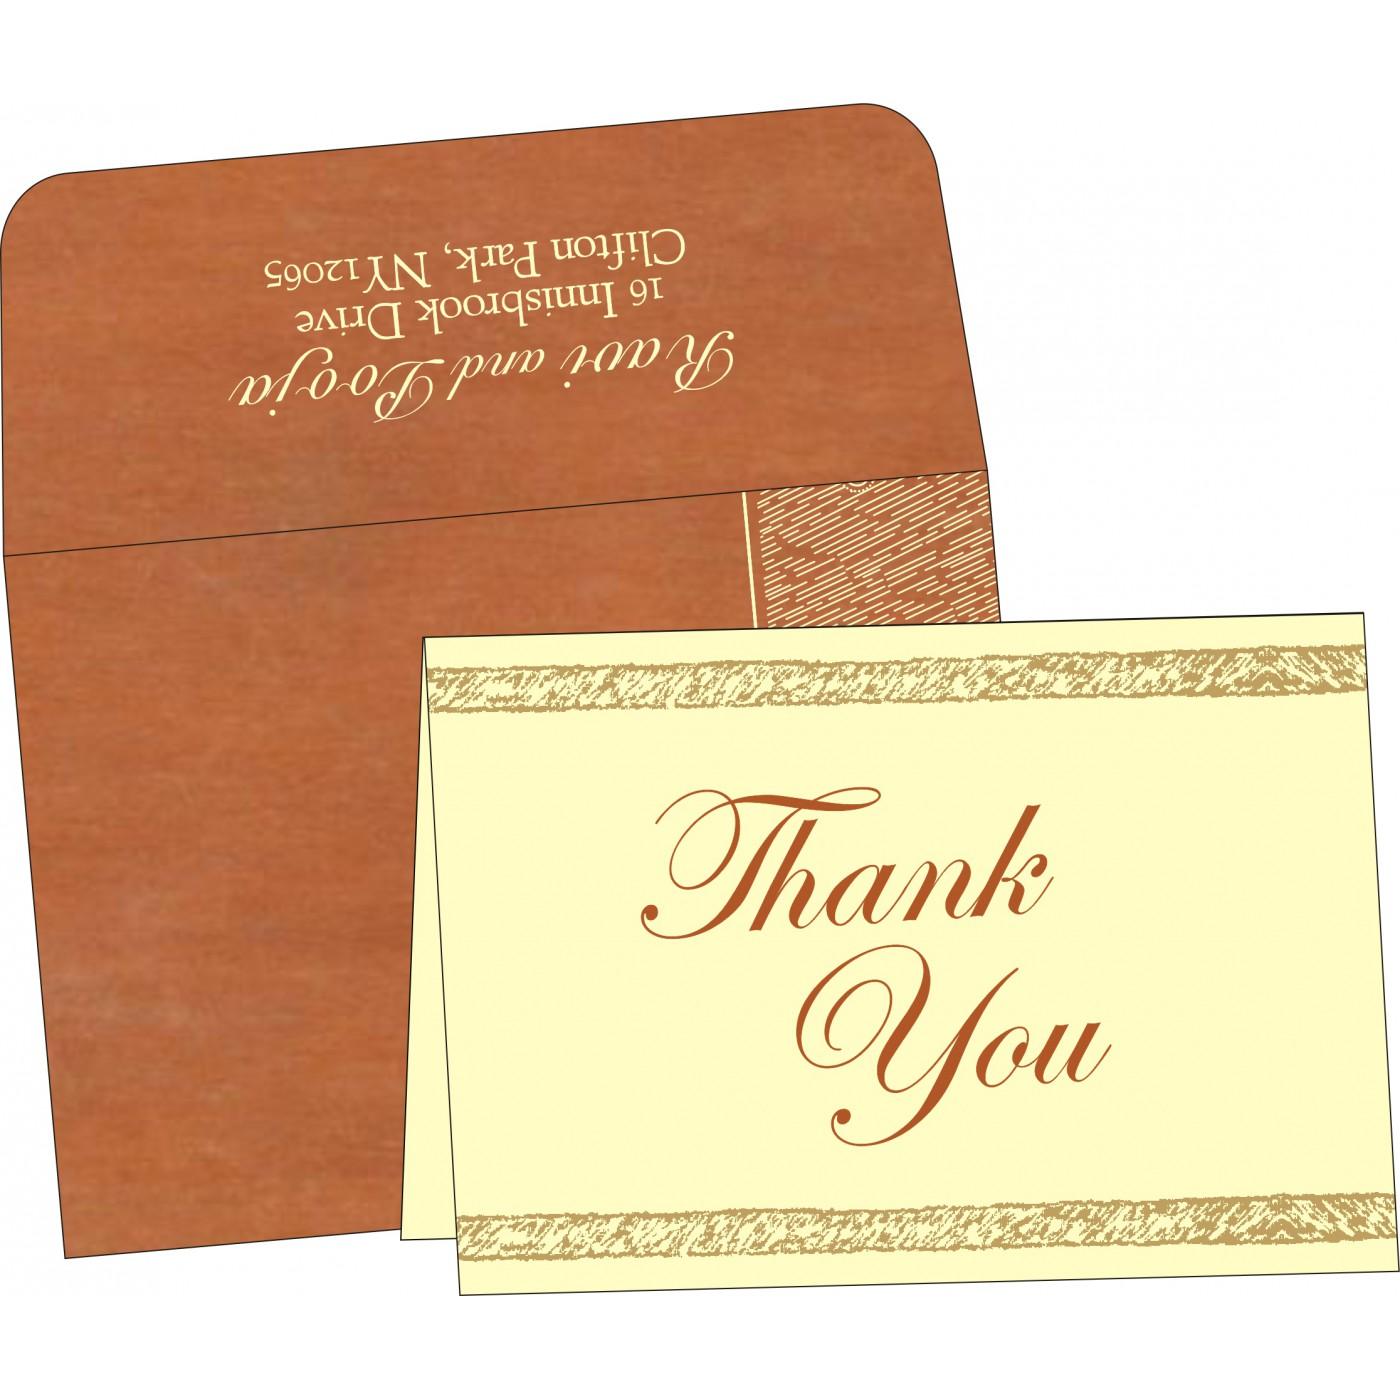 Thank You Cards : TYC-8209D - 123WeddingCards